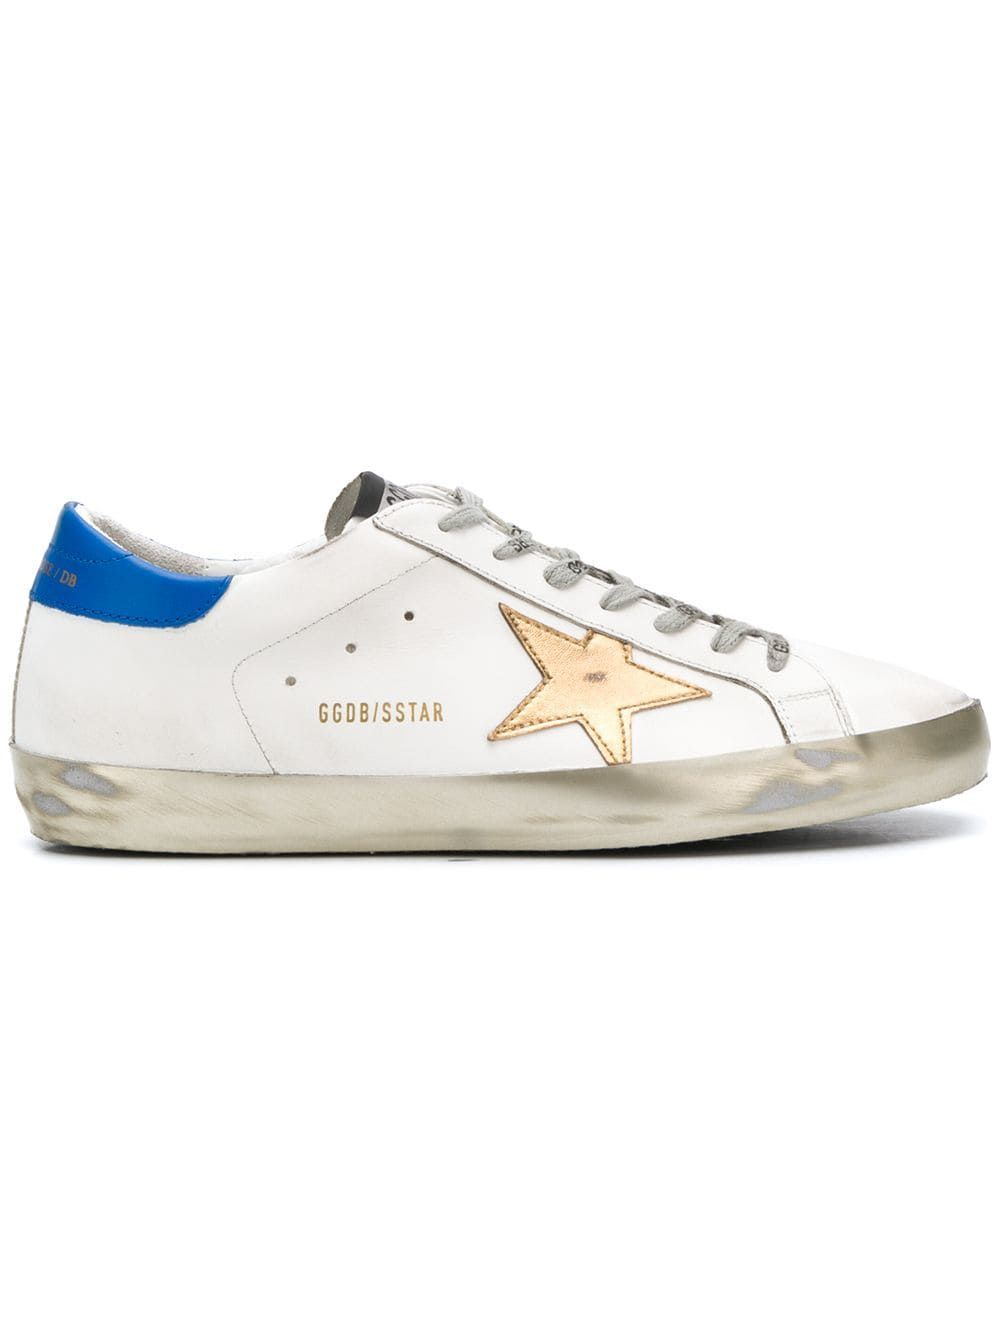 Golden Goose Superstar Sneakers In White Modesens Golden Goose Deluxe Brand Sneakers Sneaker Collection